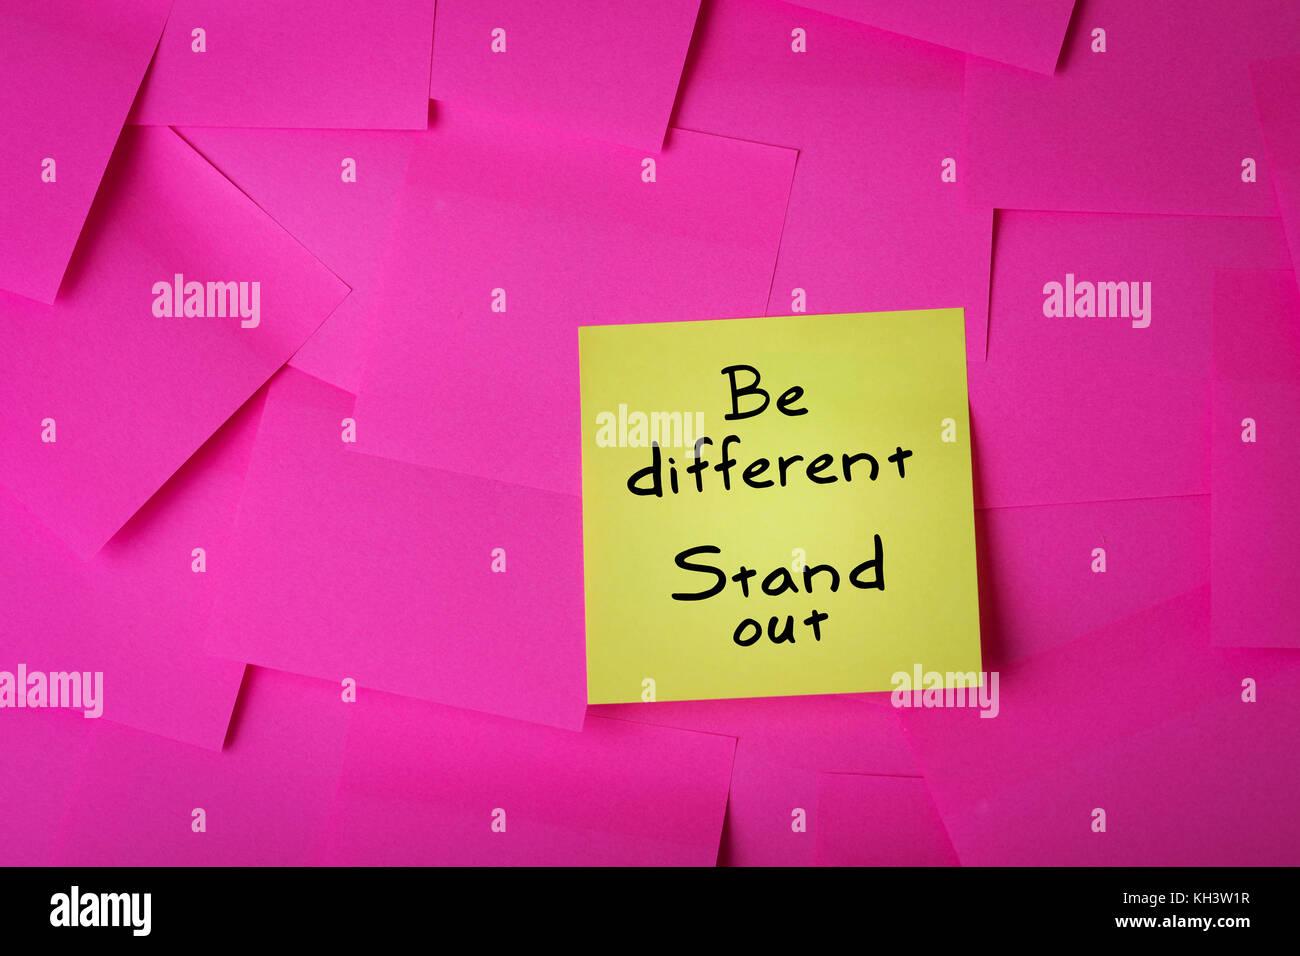 Ser diferente se destacan el texto de nota adhesiva amarilla Foto de stock